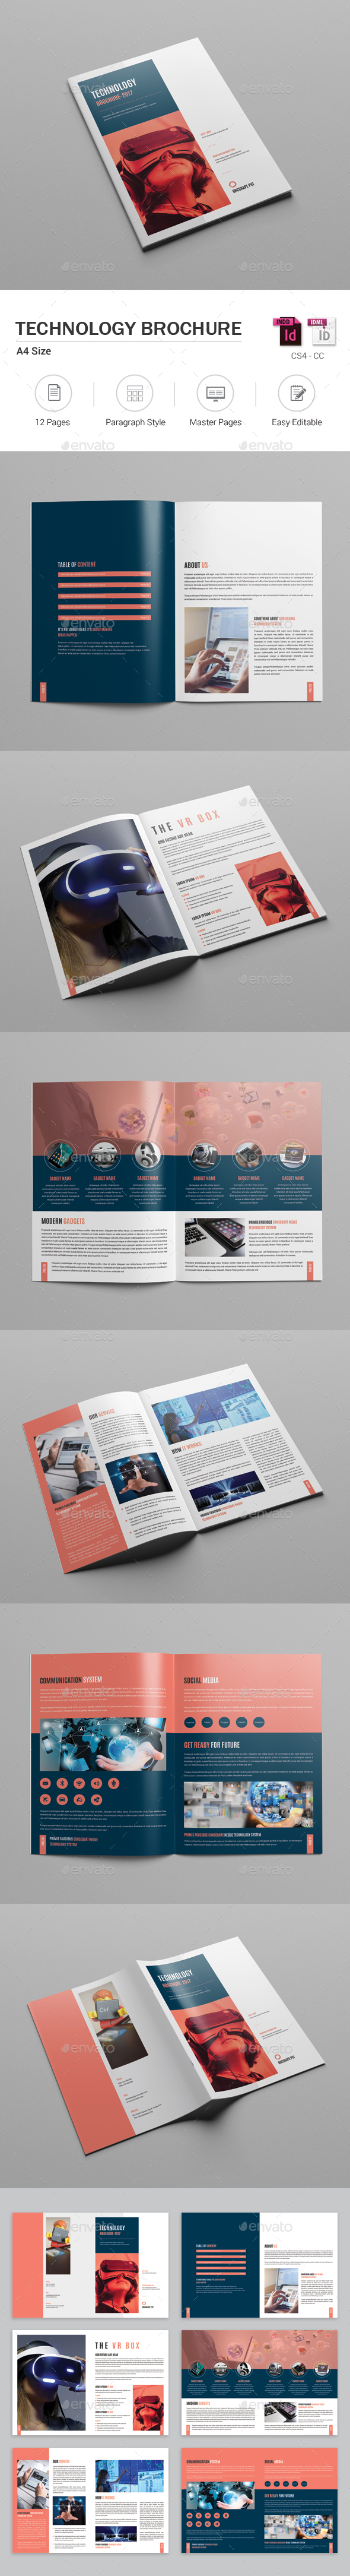 Technology Brochure - Corporate Brochures